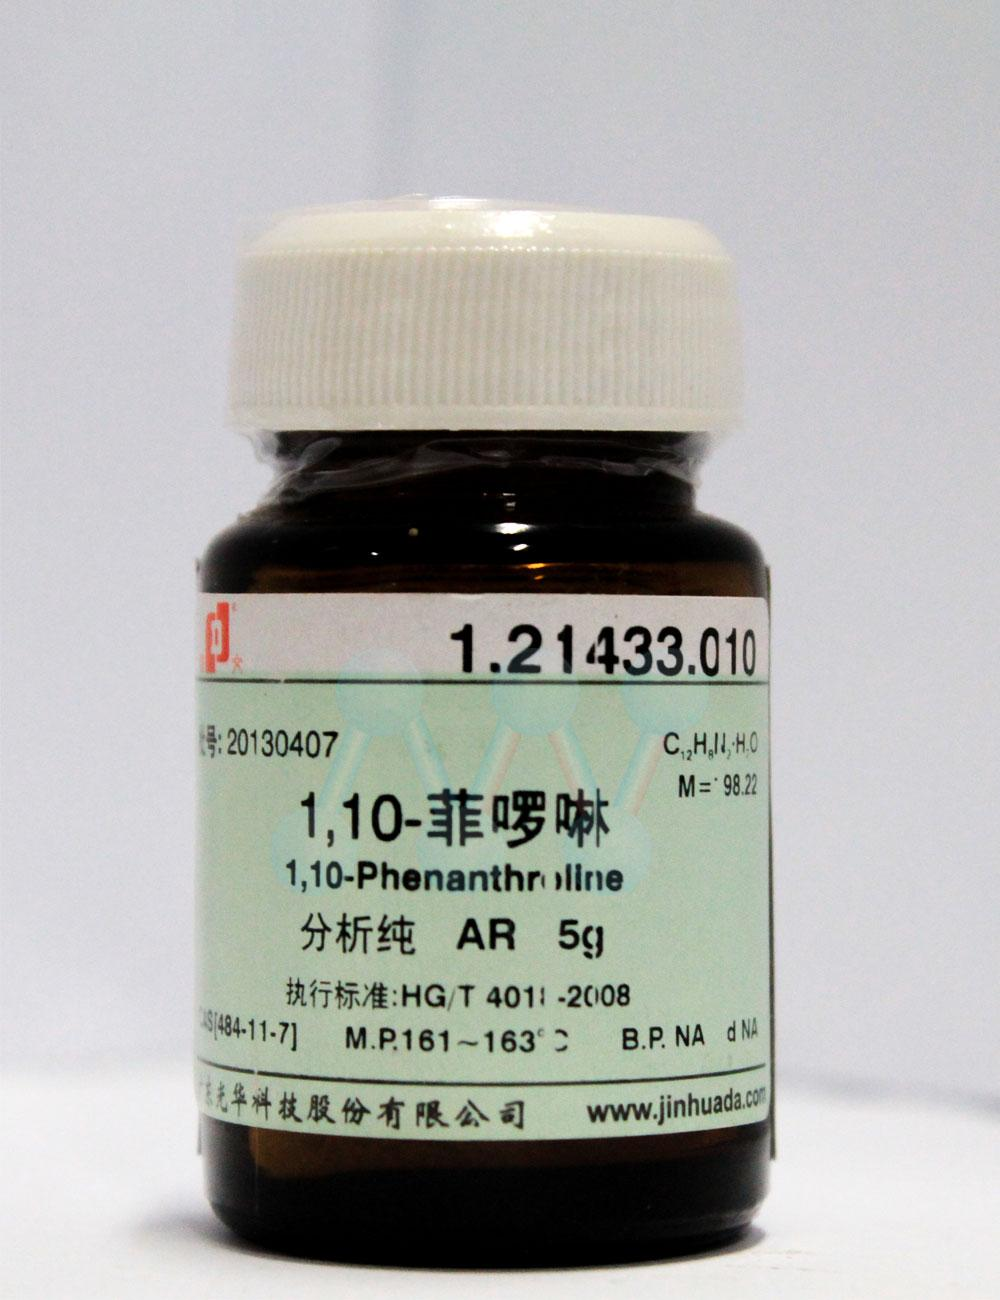 1,10-Phenanthroline C12H8N2.H2O